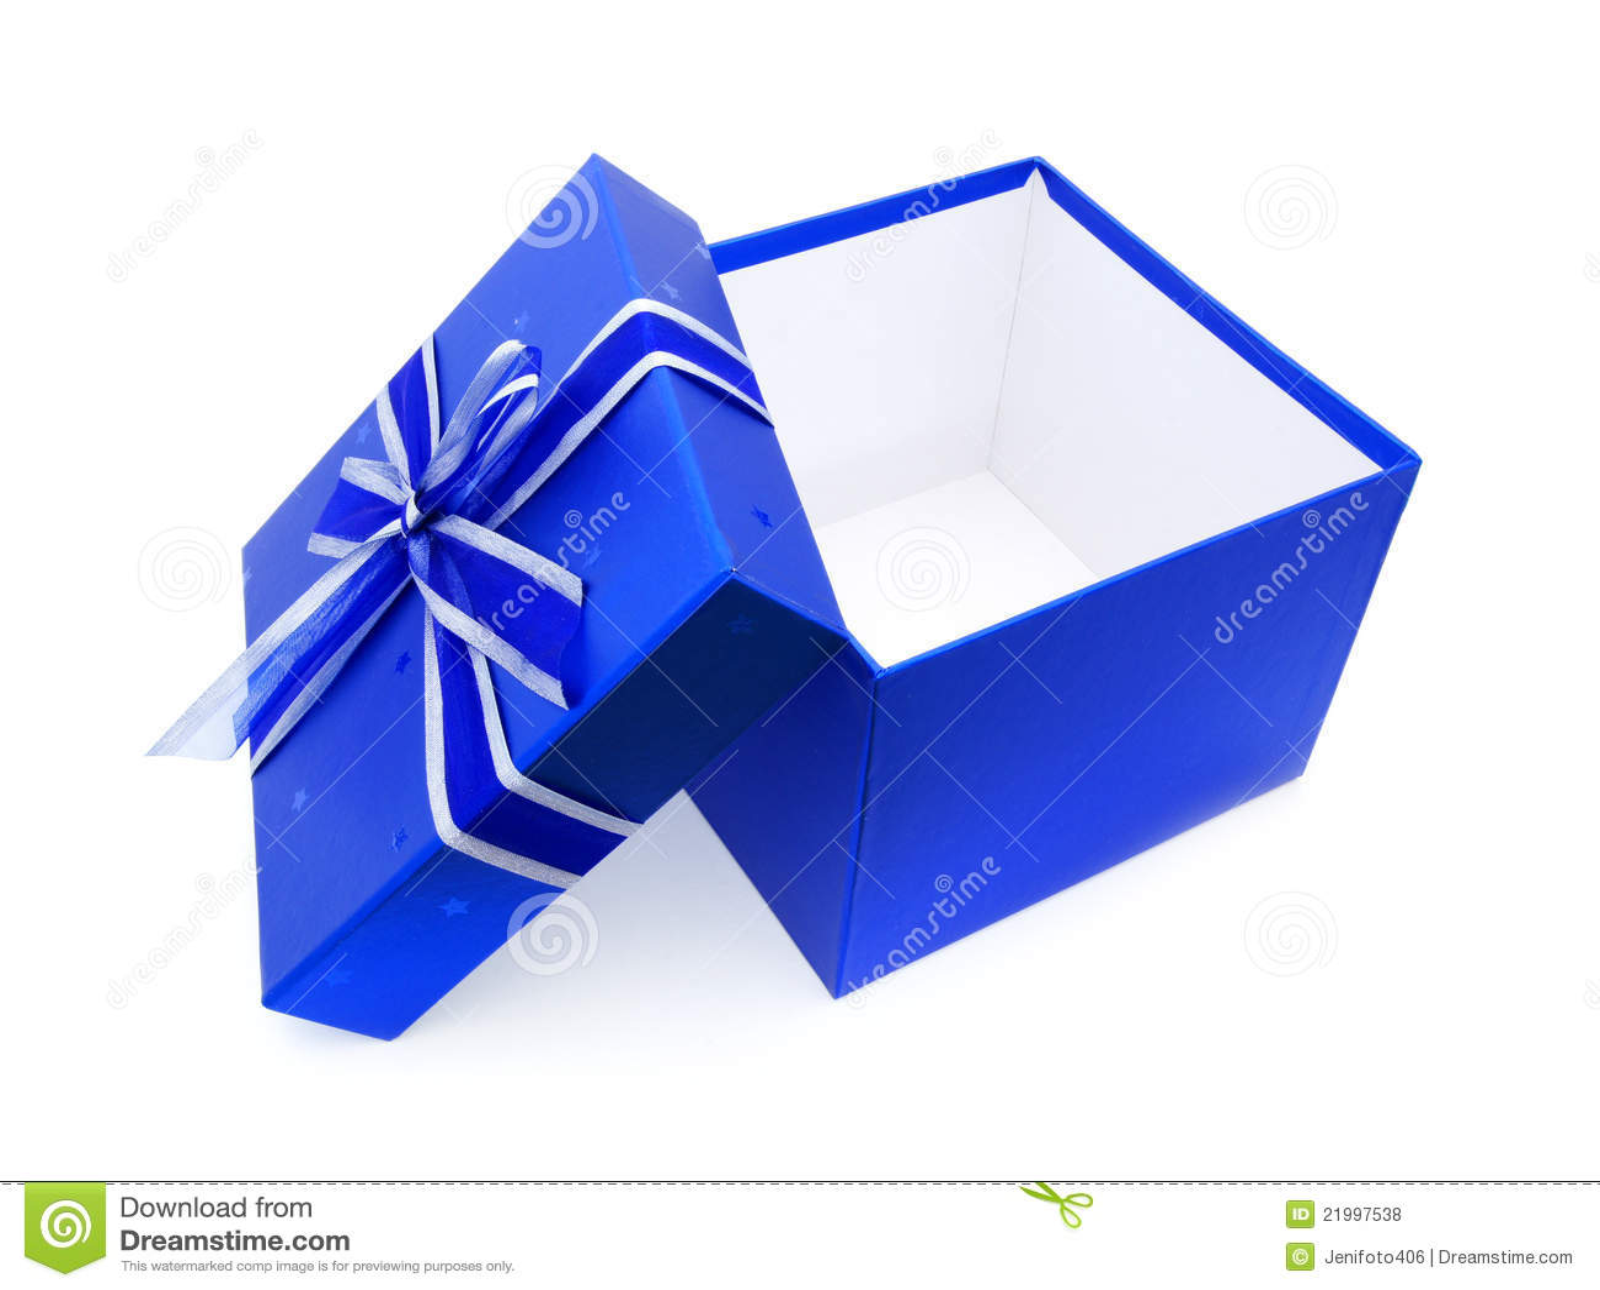 Opened Blue Gift Box Stock Photo 21997538